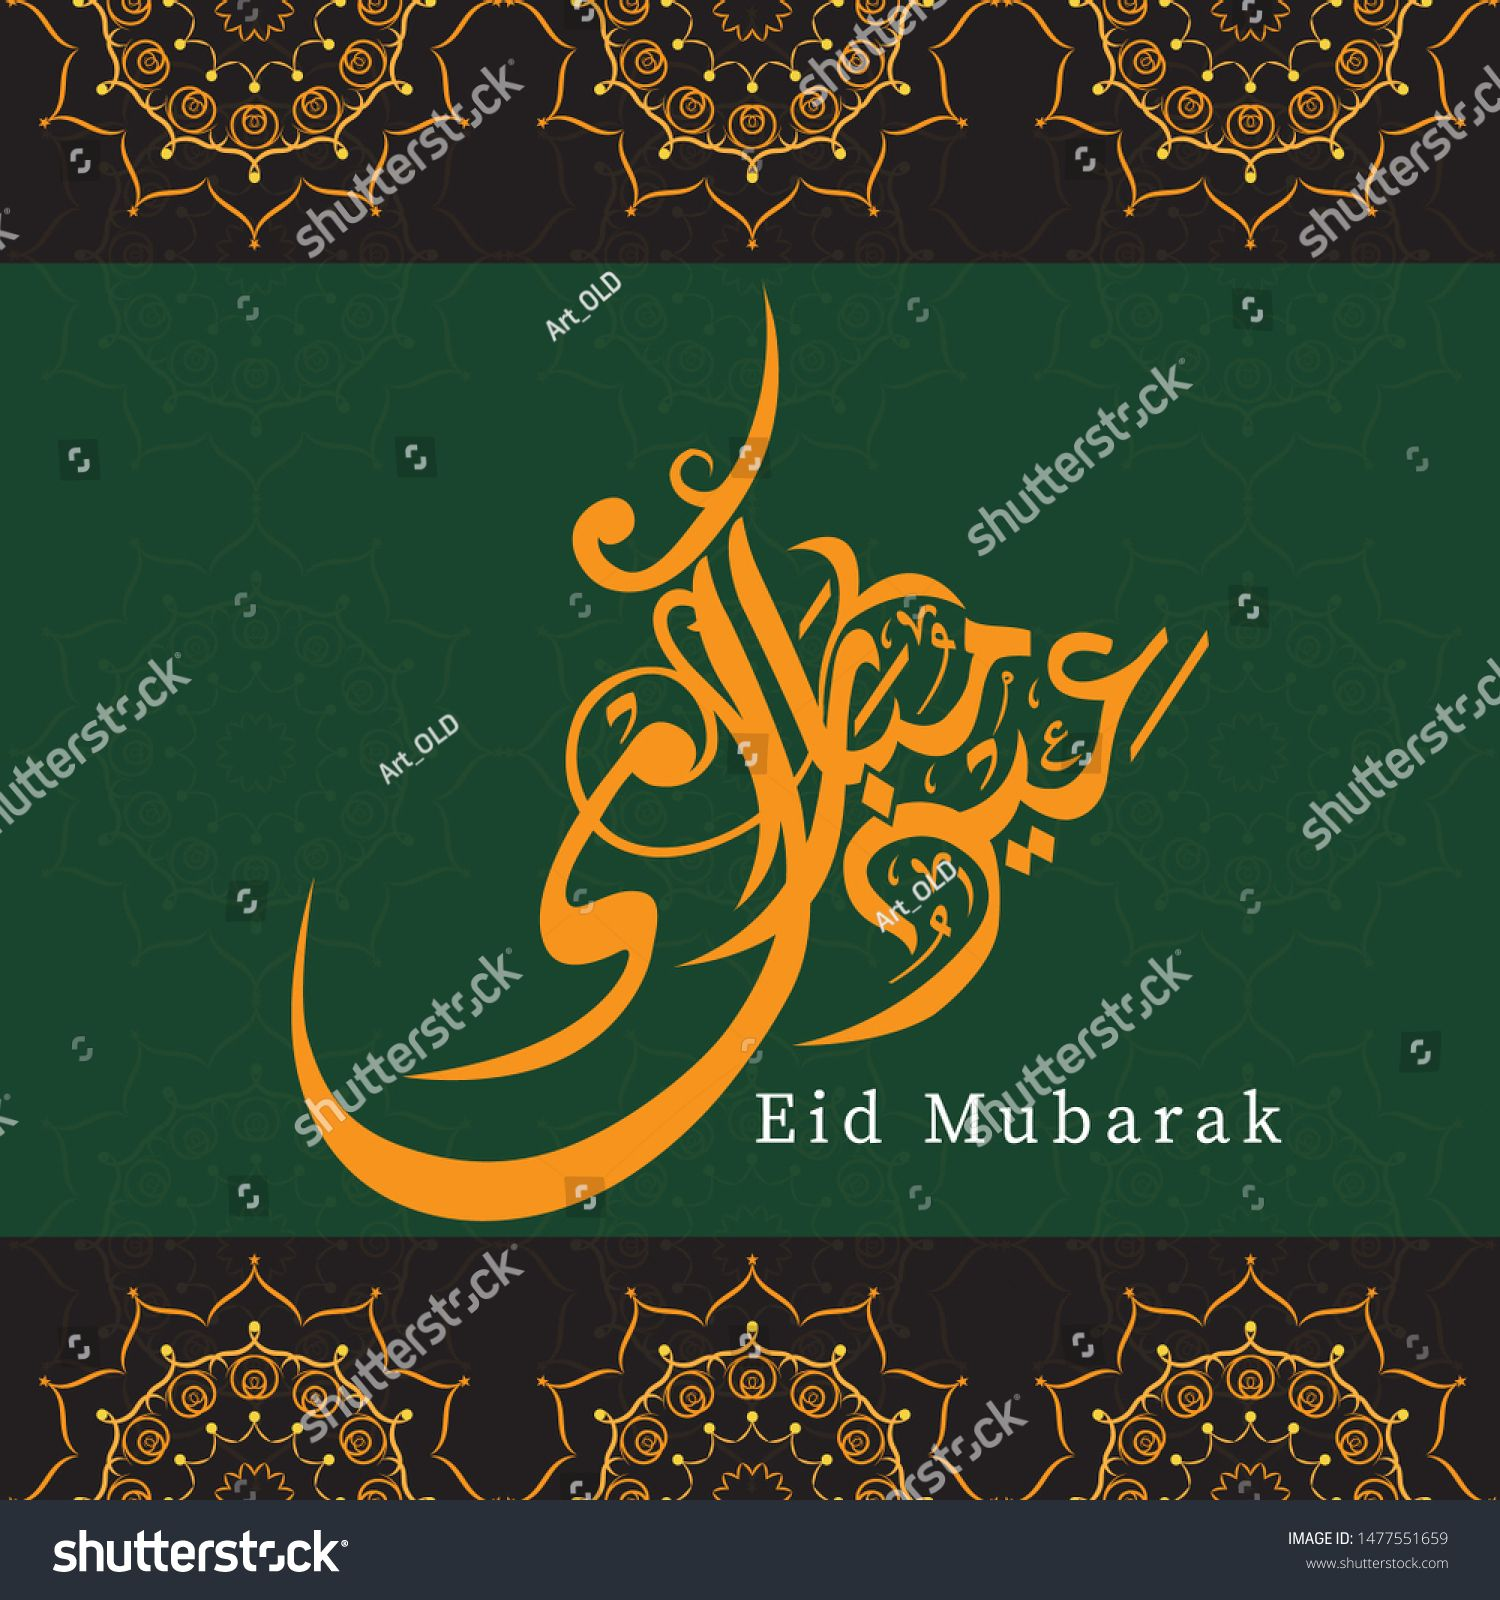 Eid Mubarak Greeting Card Template Islamic Design Motif And